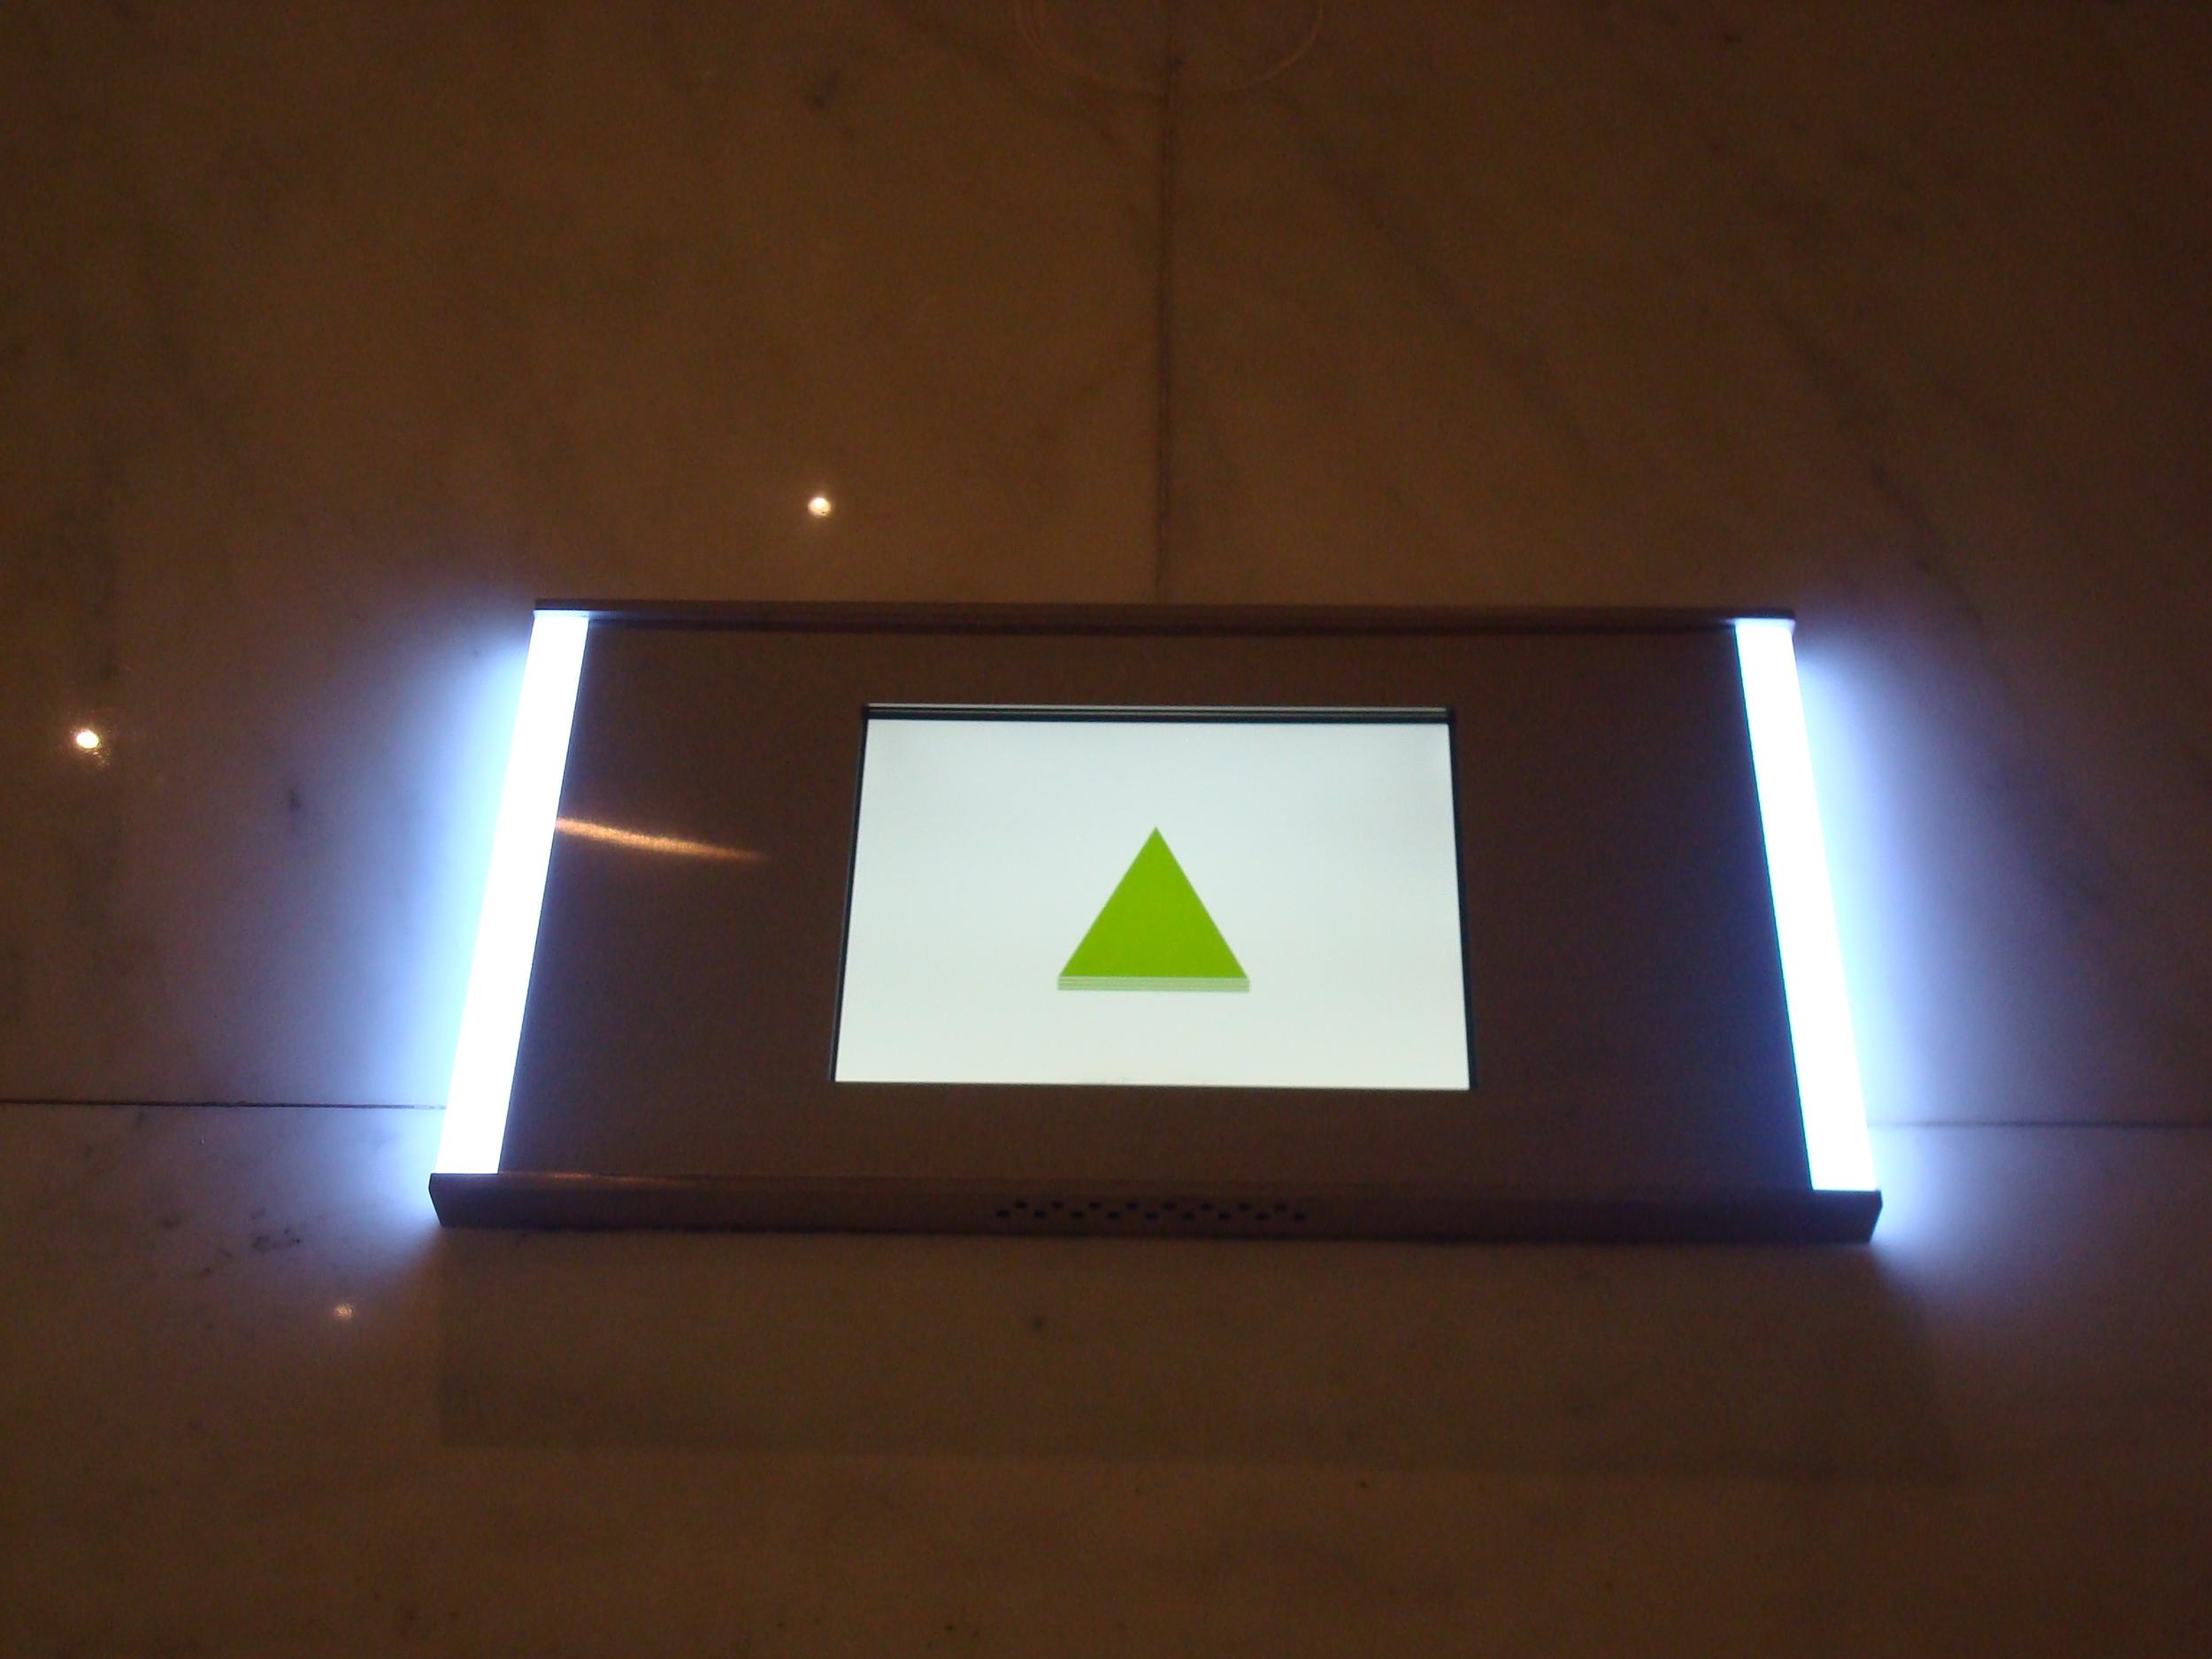 Hall Signal indicating the elevator is traveling upwards